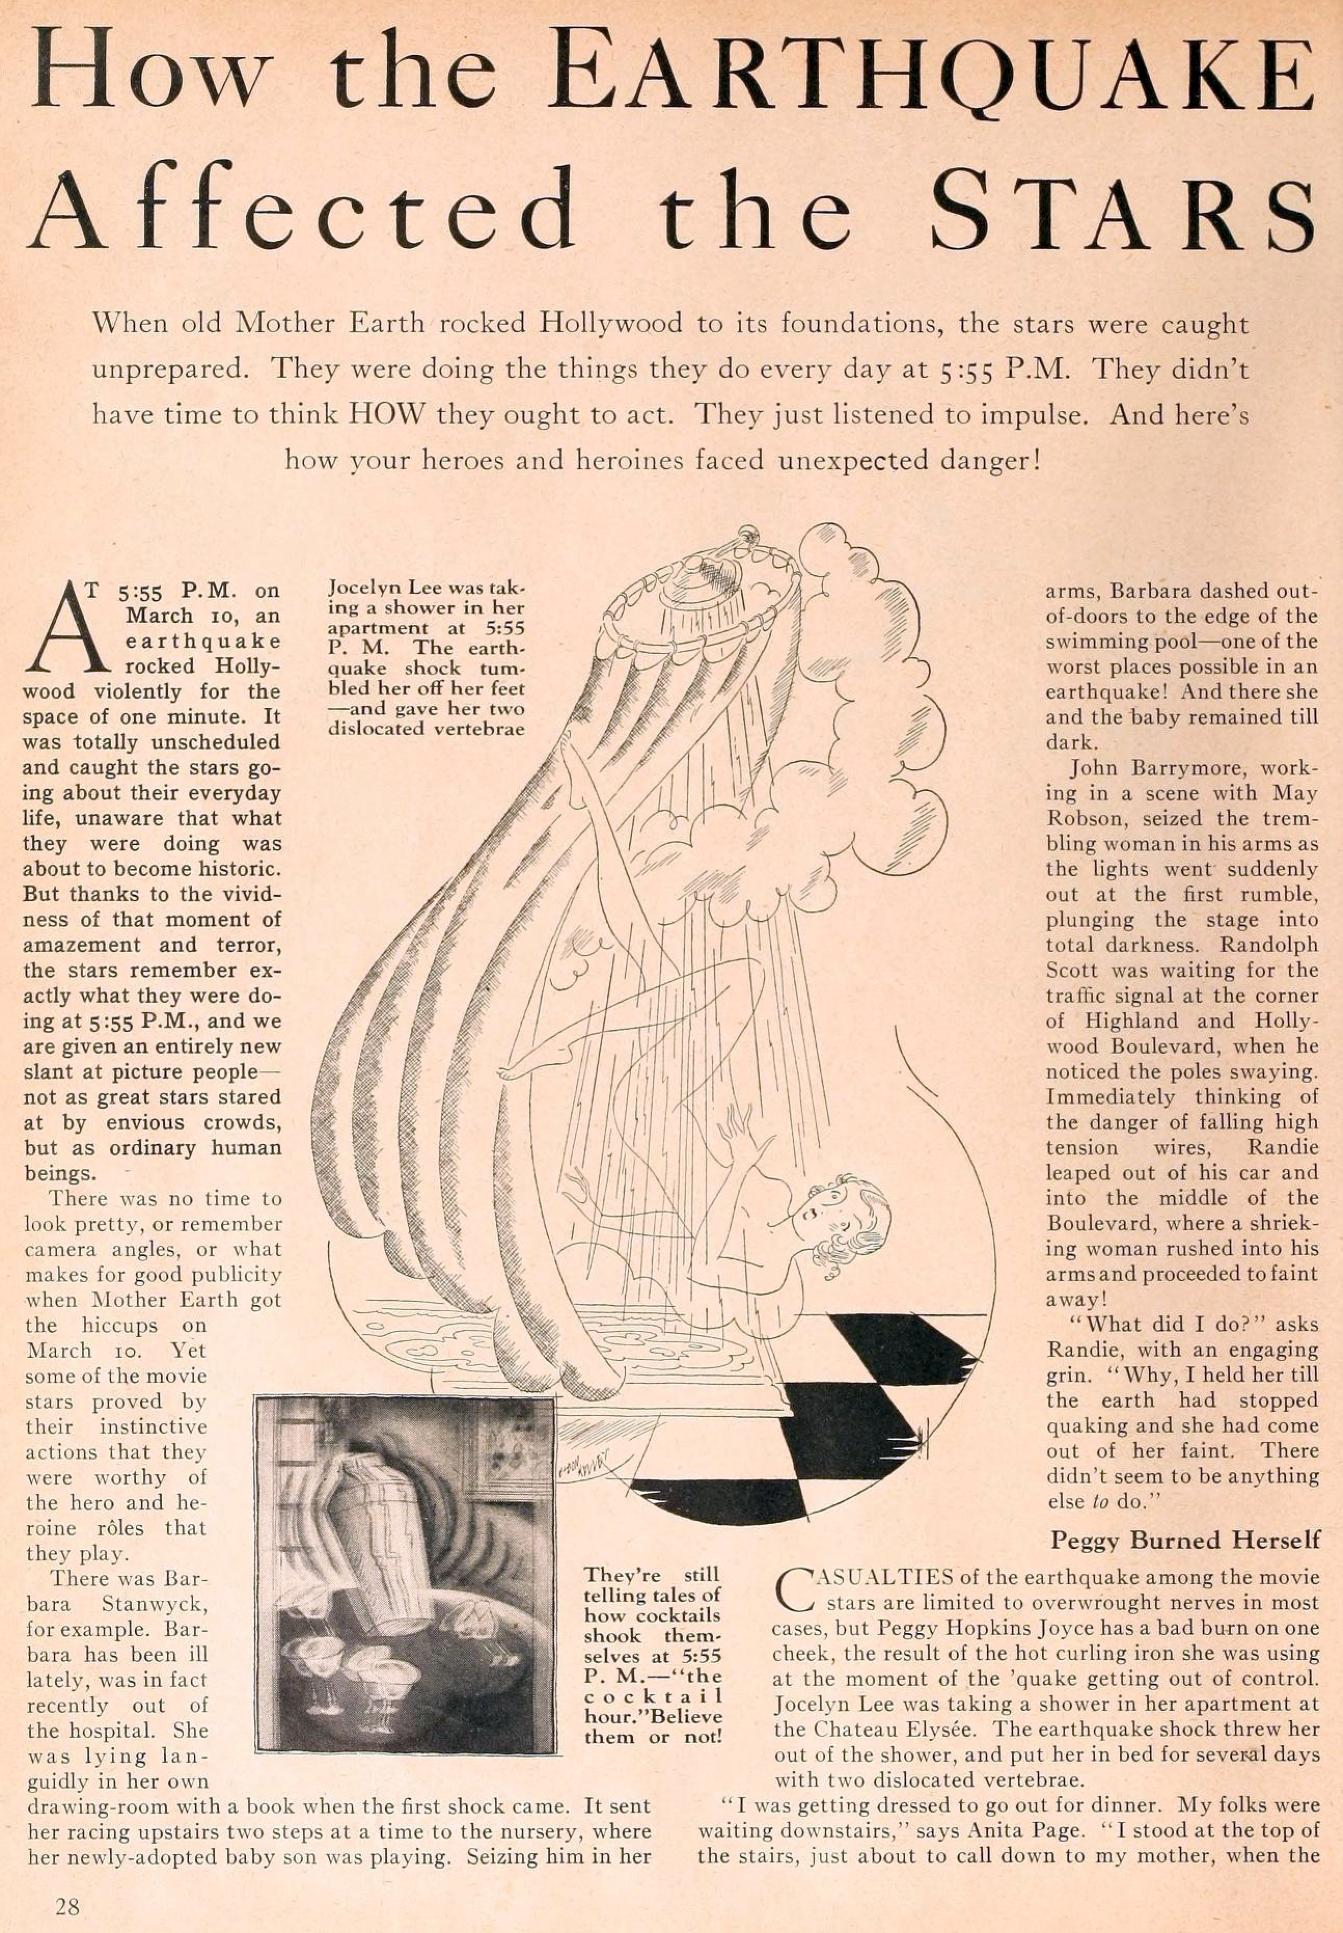 carole lombard motion picture june 1933 earthquake 00a